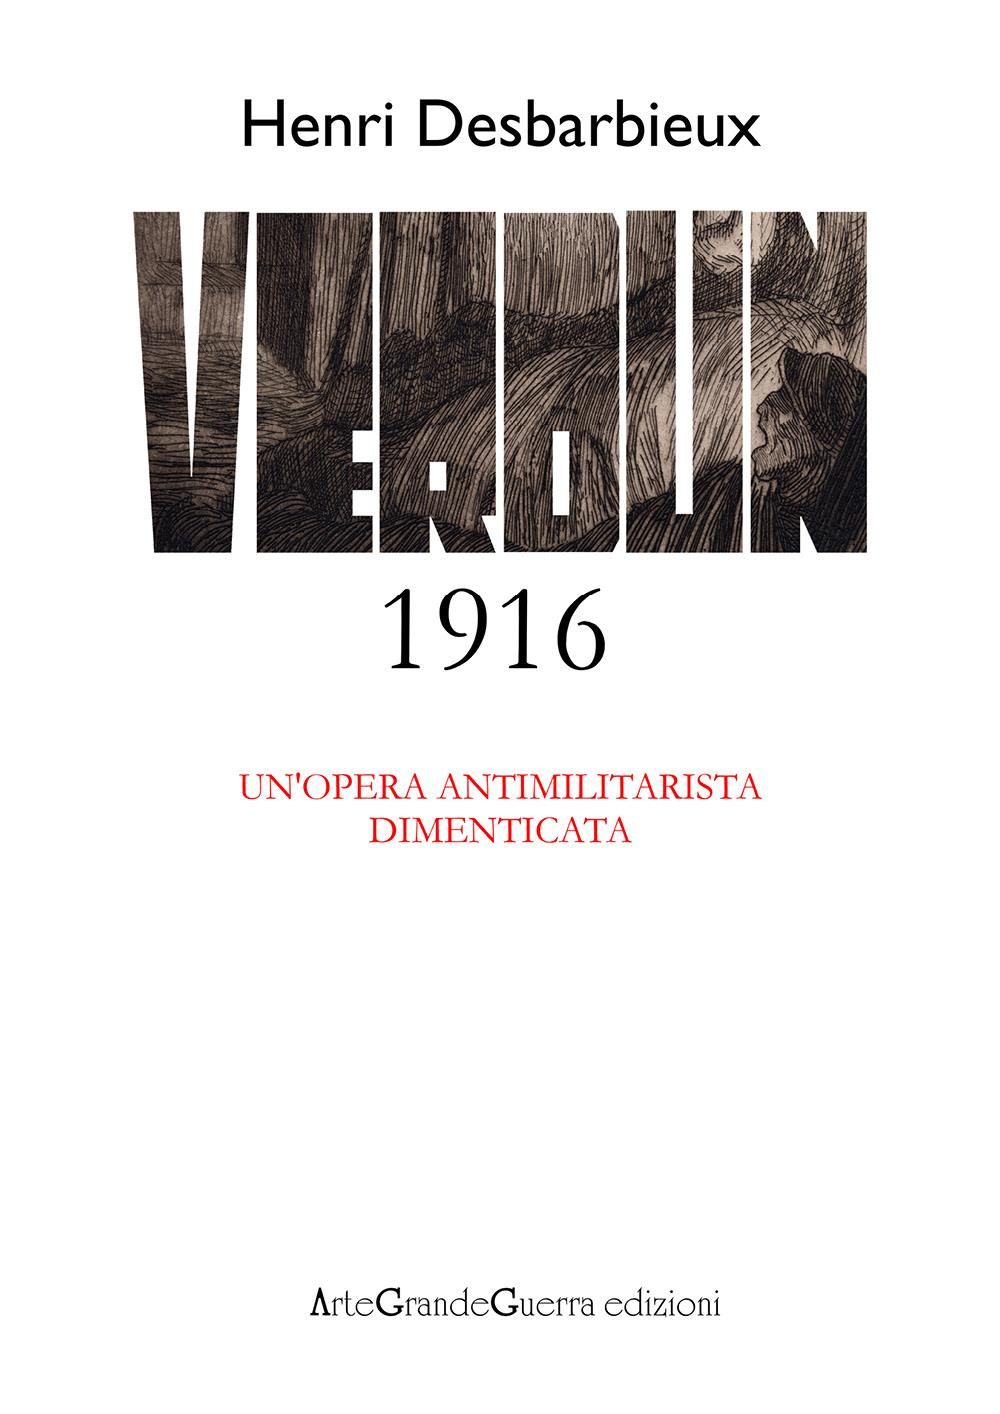 Henri Desbarbieux. Verdun 1916. Un'opera antimilitarista dimenticata